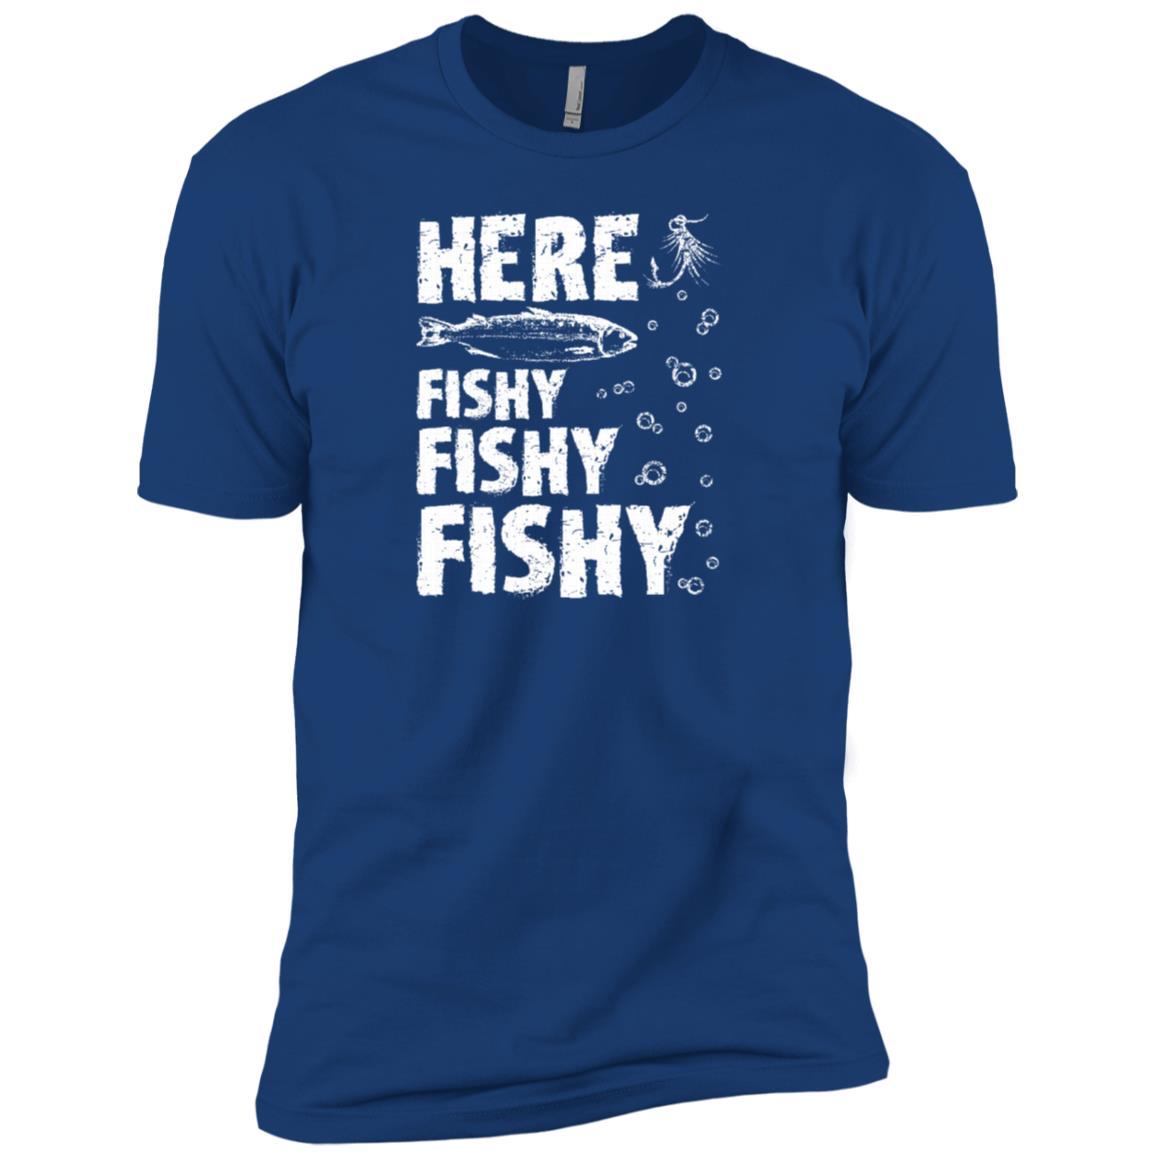 Funny Here Fishy Fishy Fishy Fisherman -1 Men Short Sleeve T-Shirt